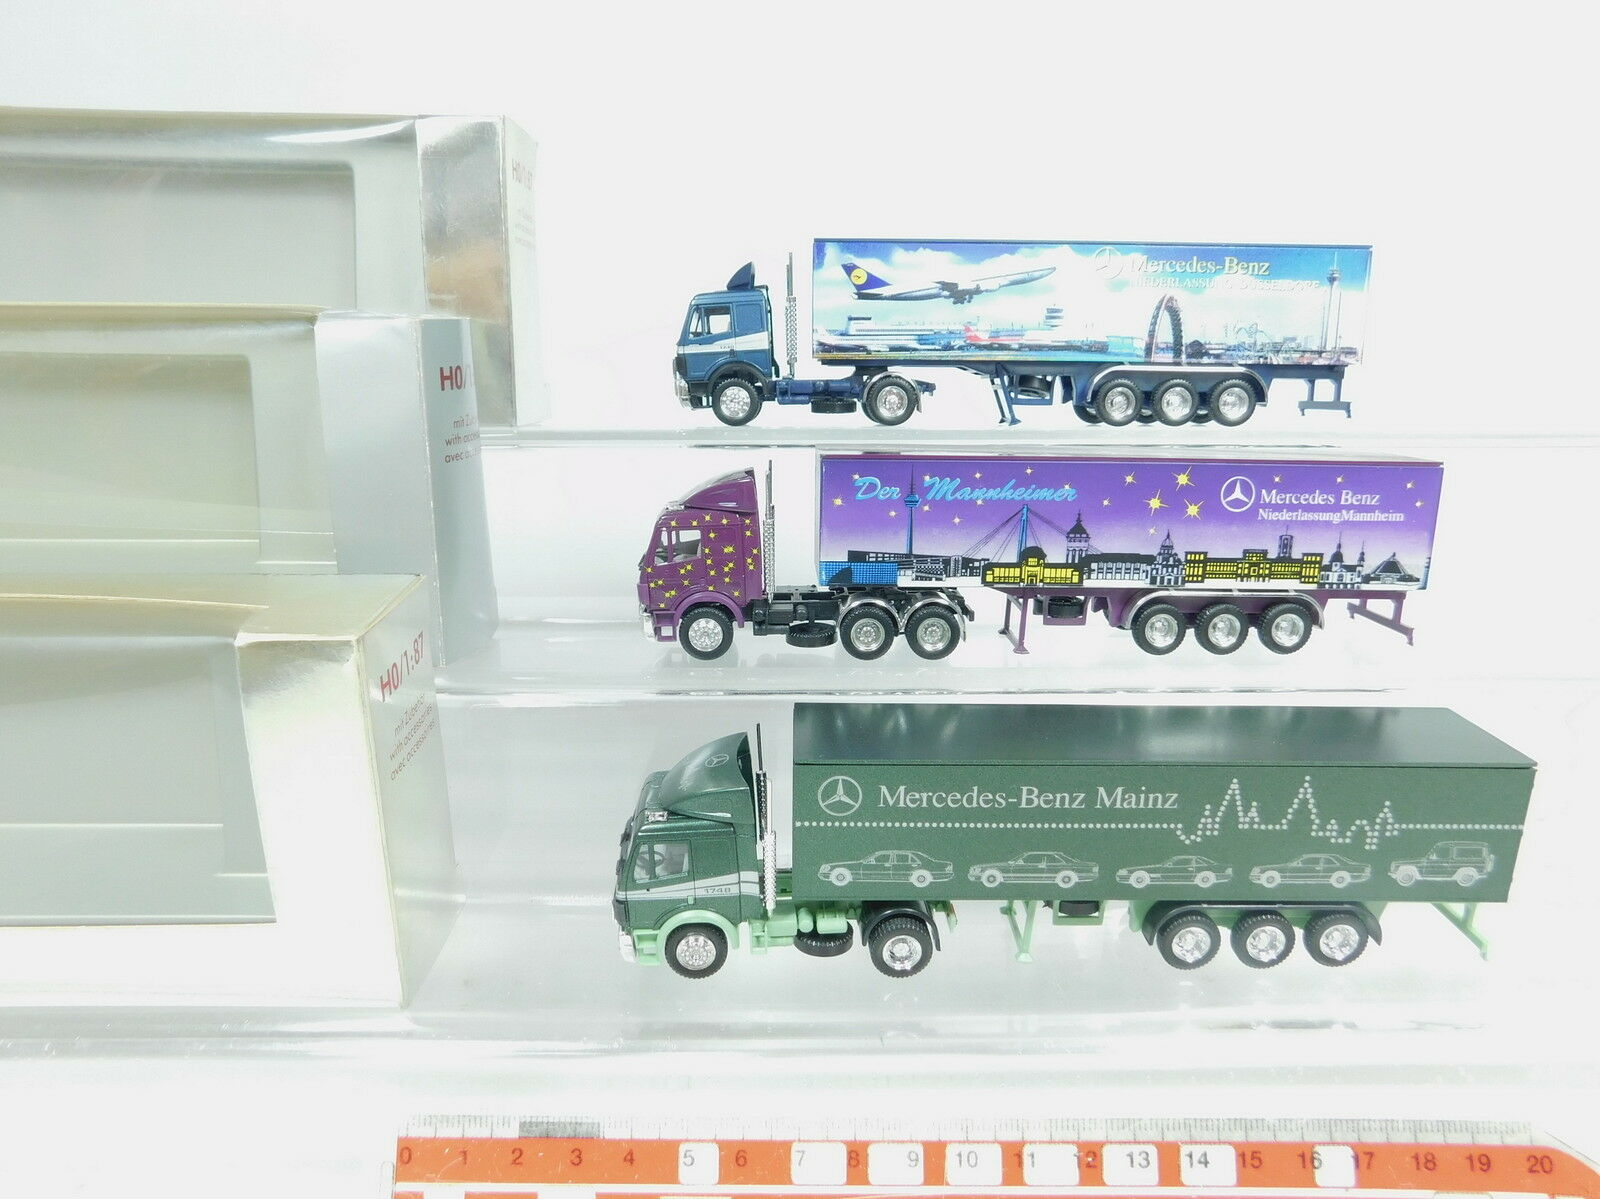 AZ411-0, 5 x Herpa Exclusive H0 (1 87) Lorry MB  Mainz +Düsseldorf+Mannheim